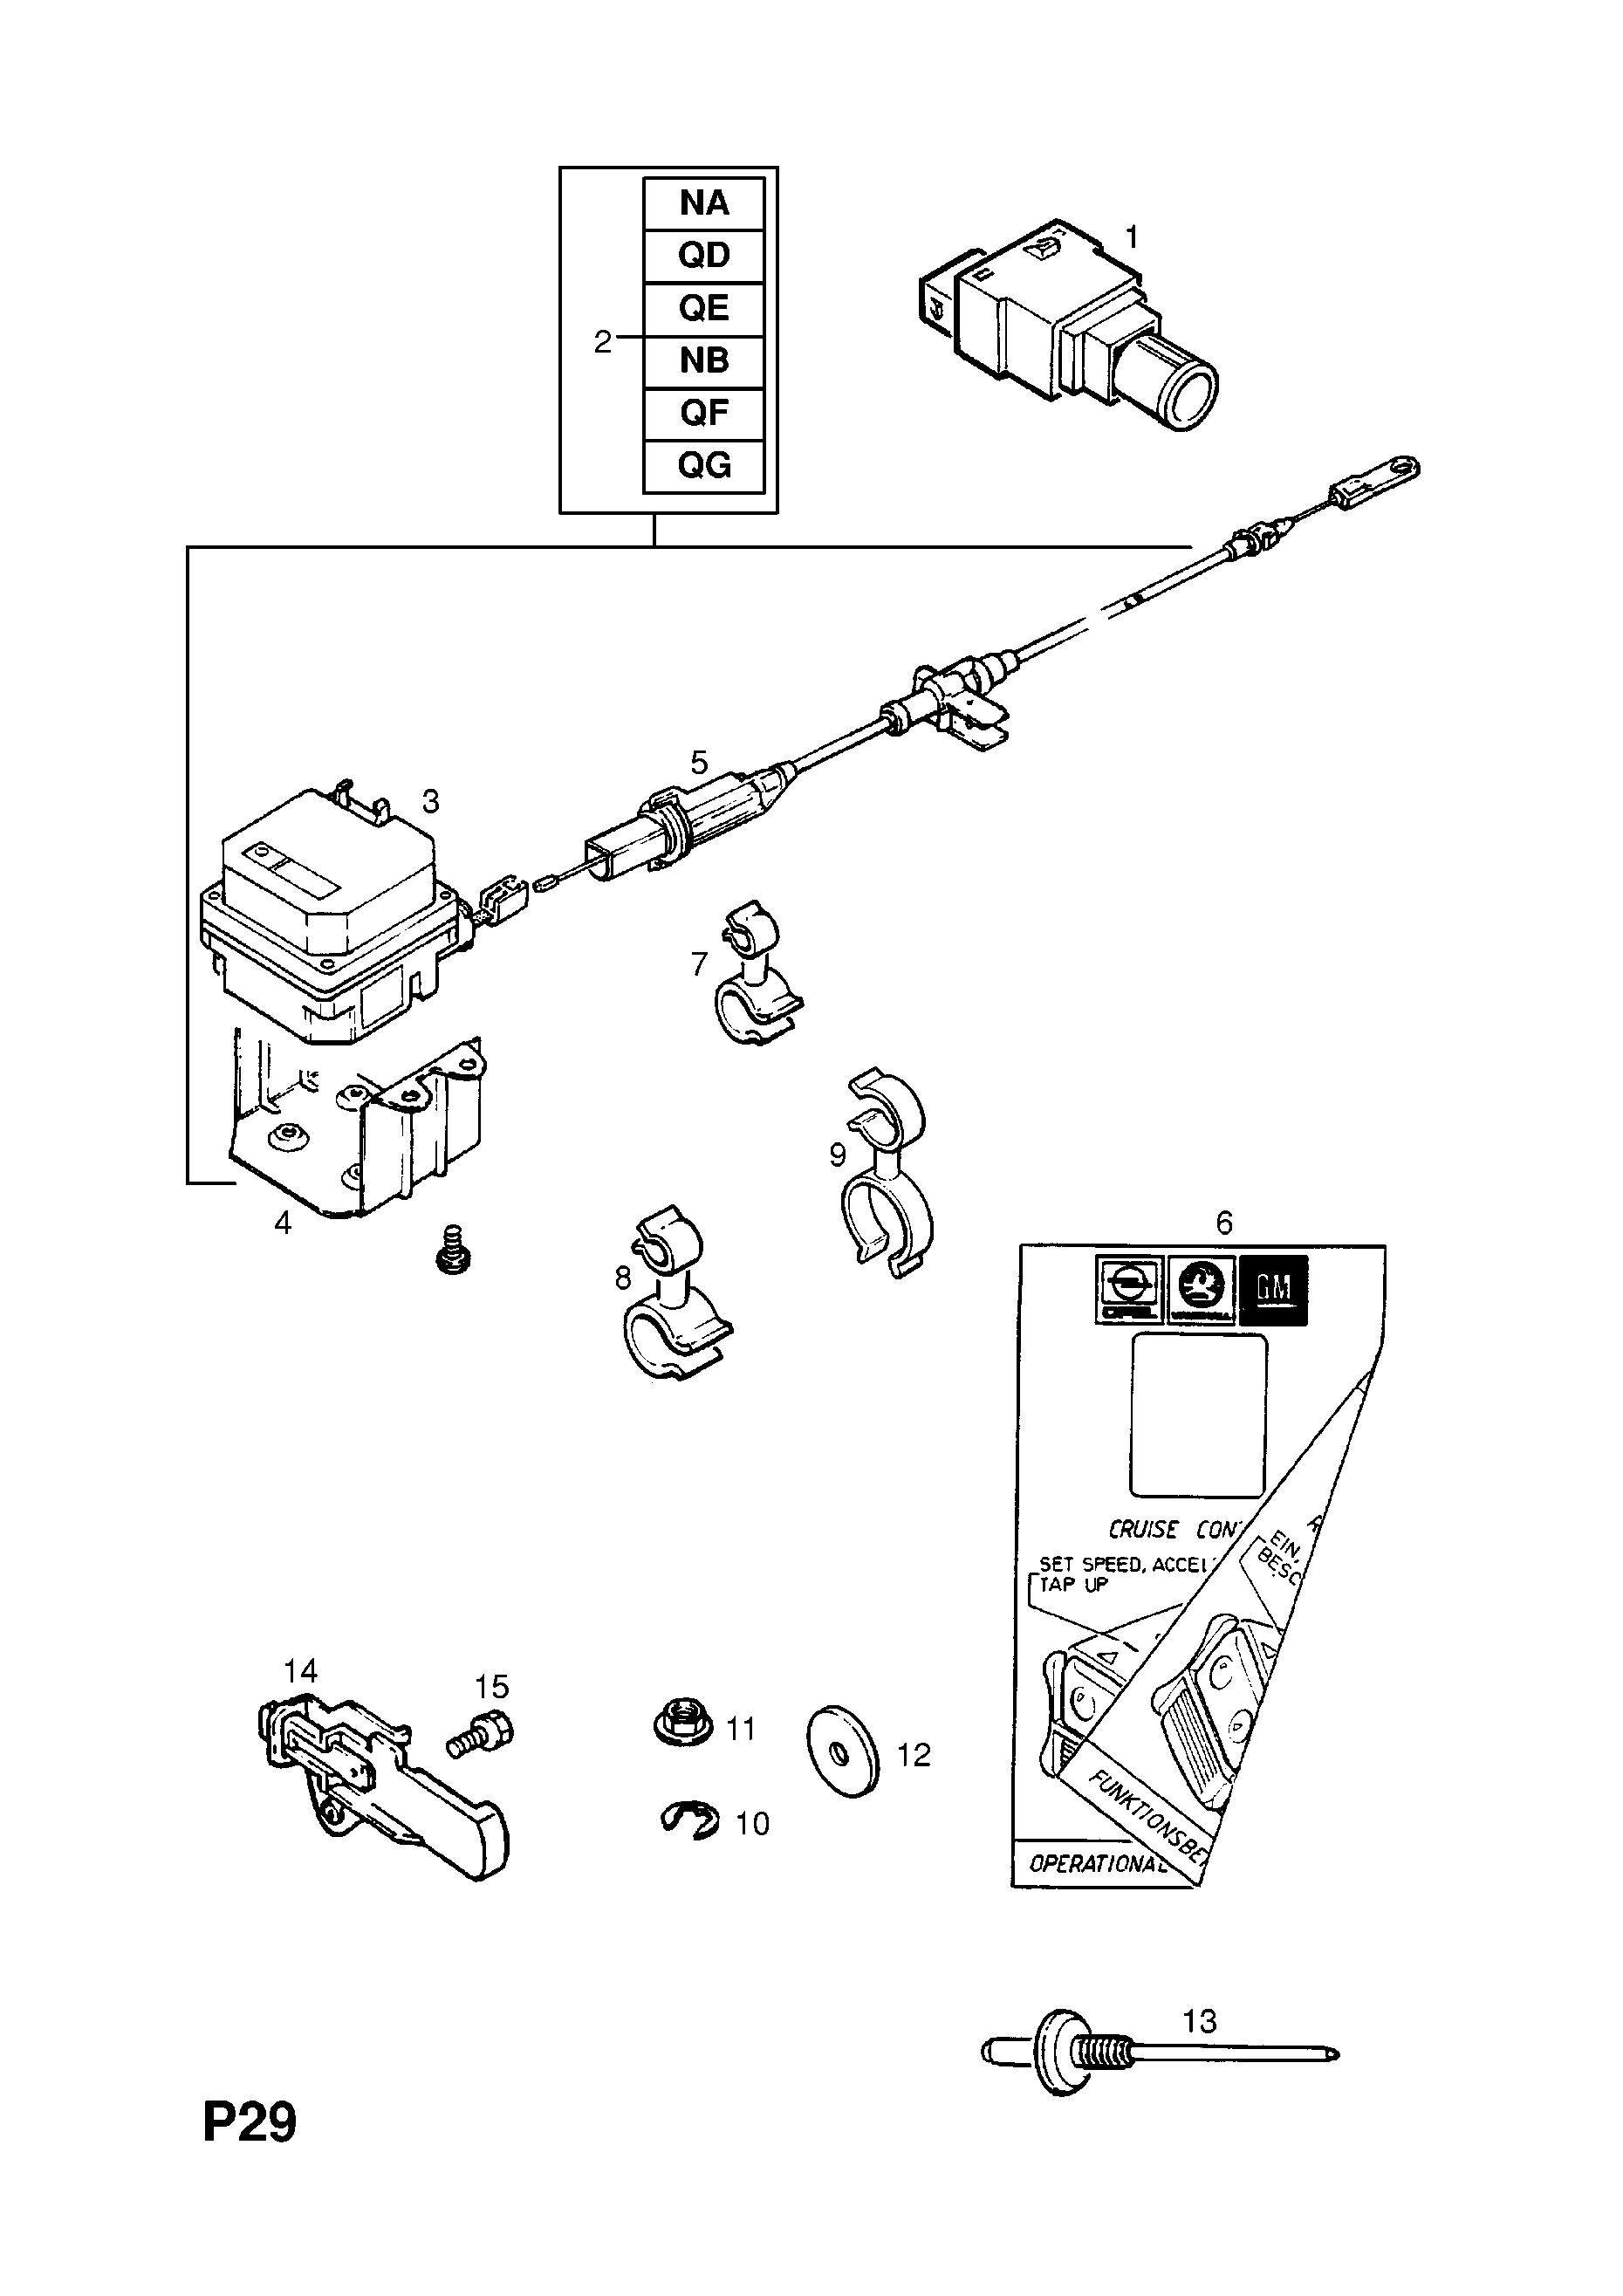 Vauxhall Vectra B Wiring Diagram